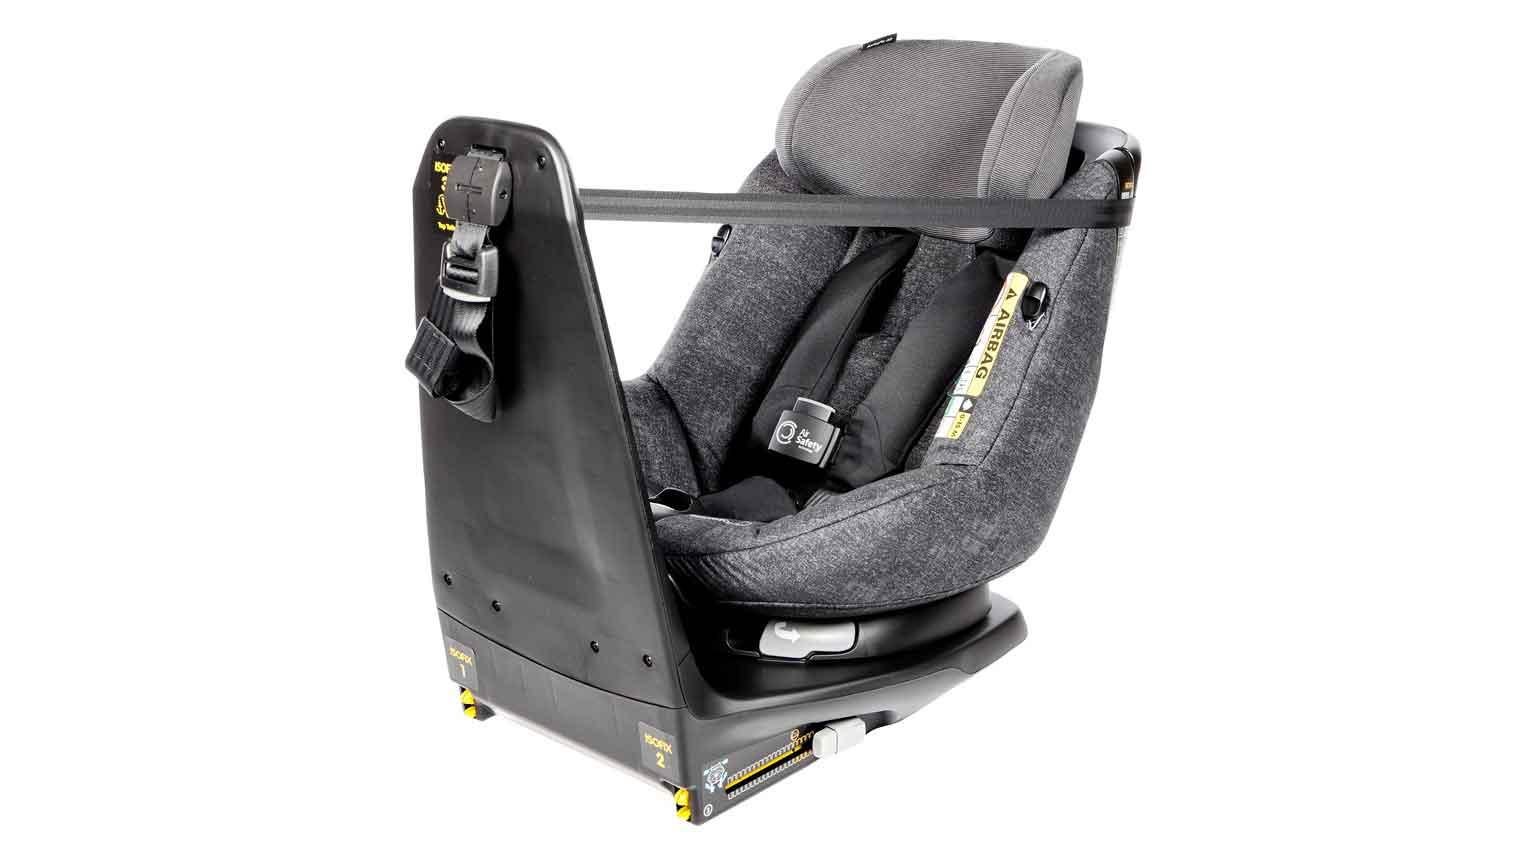 veiligste autostoel